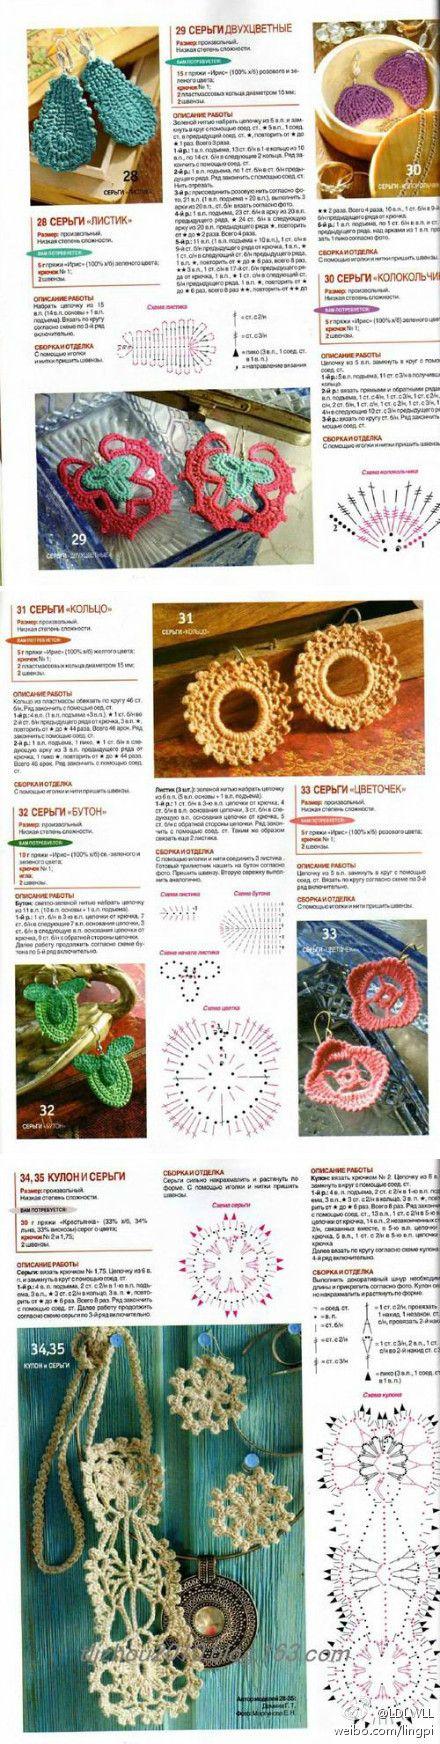 Crochet Jewelry - Chart